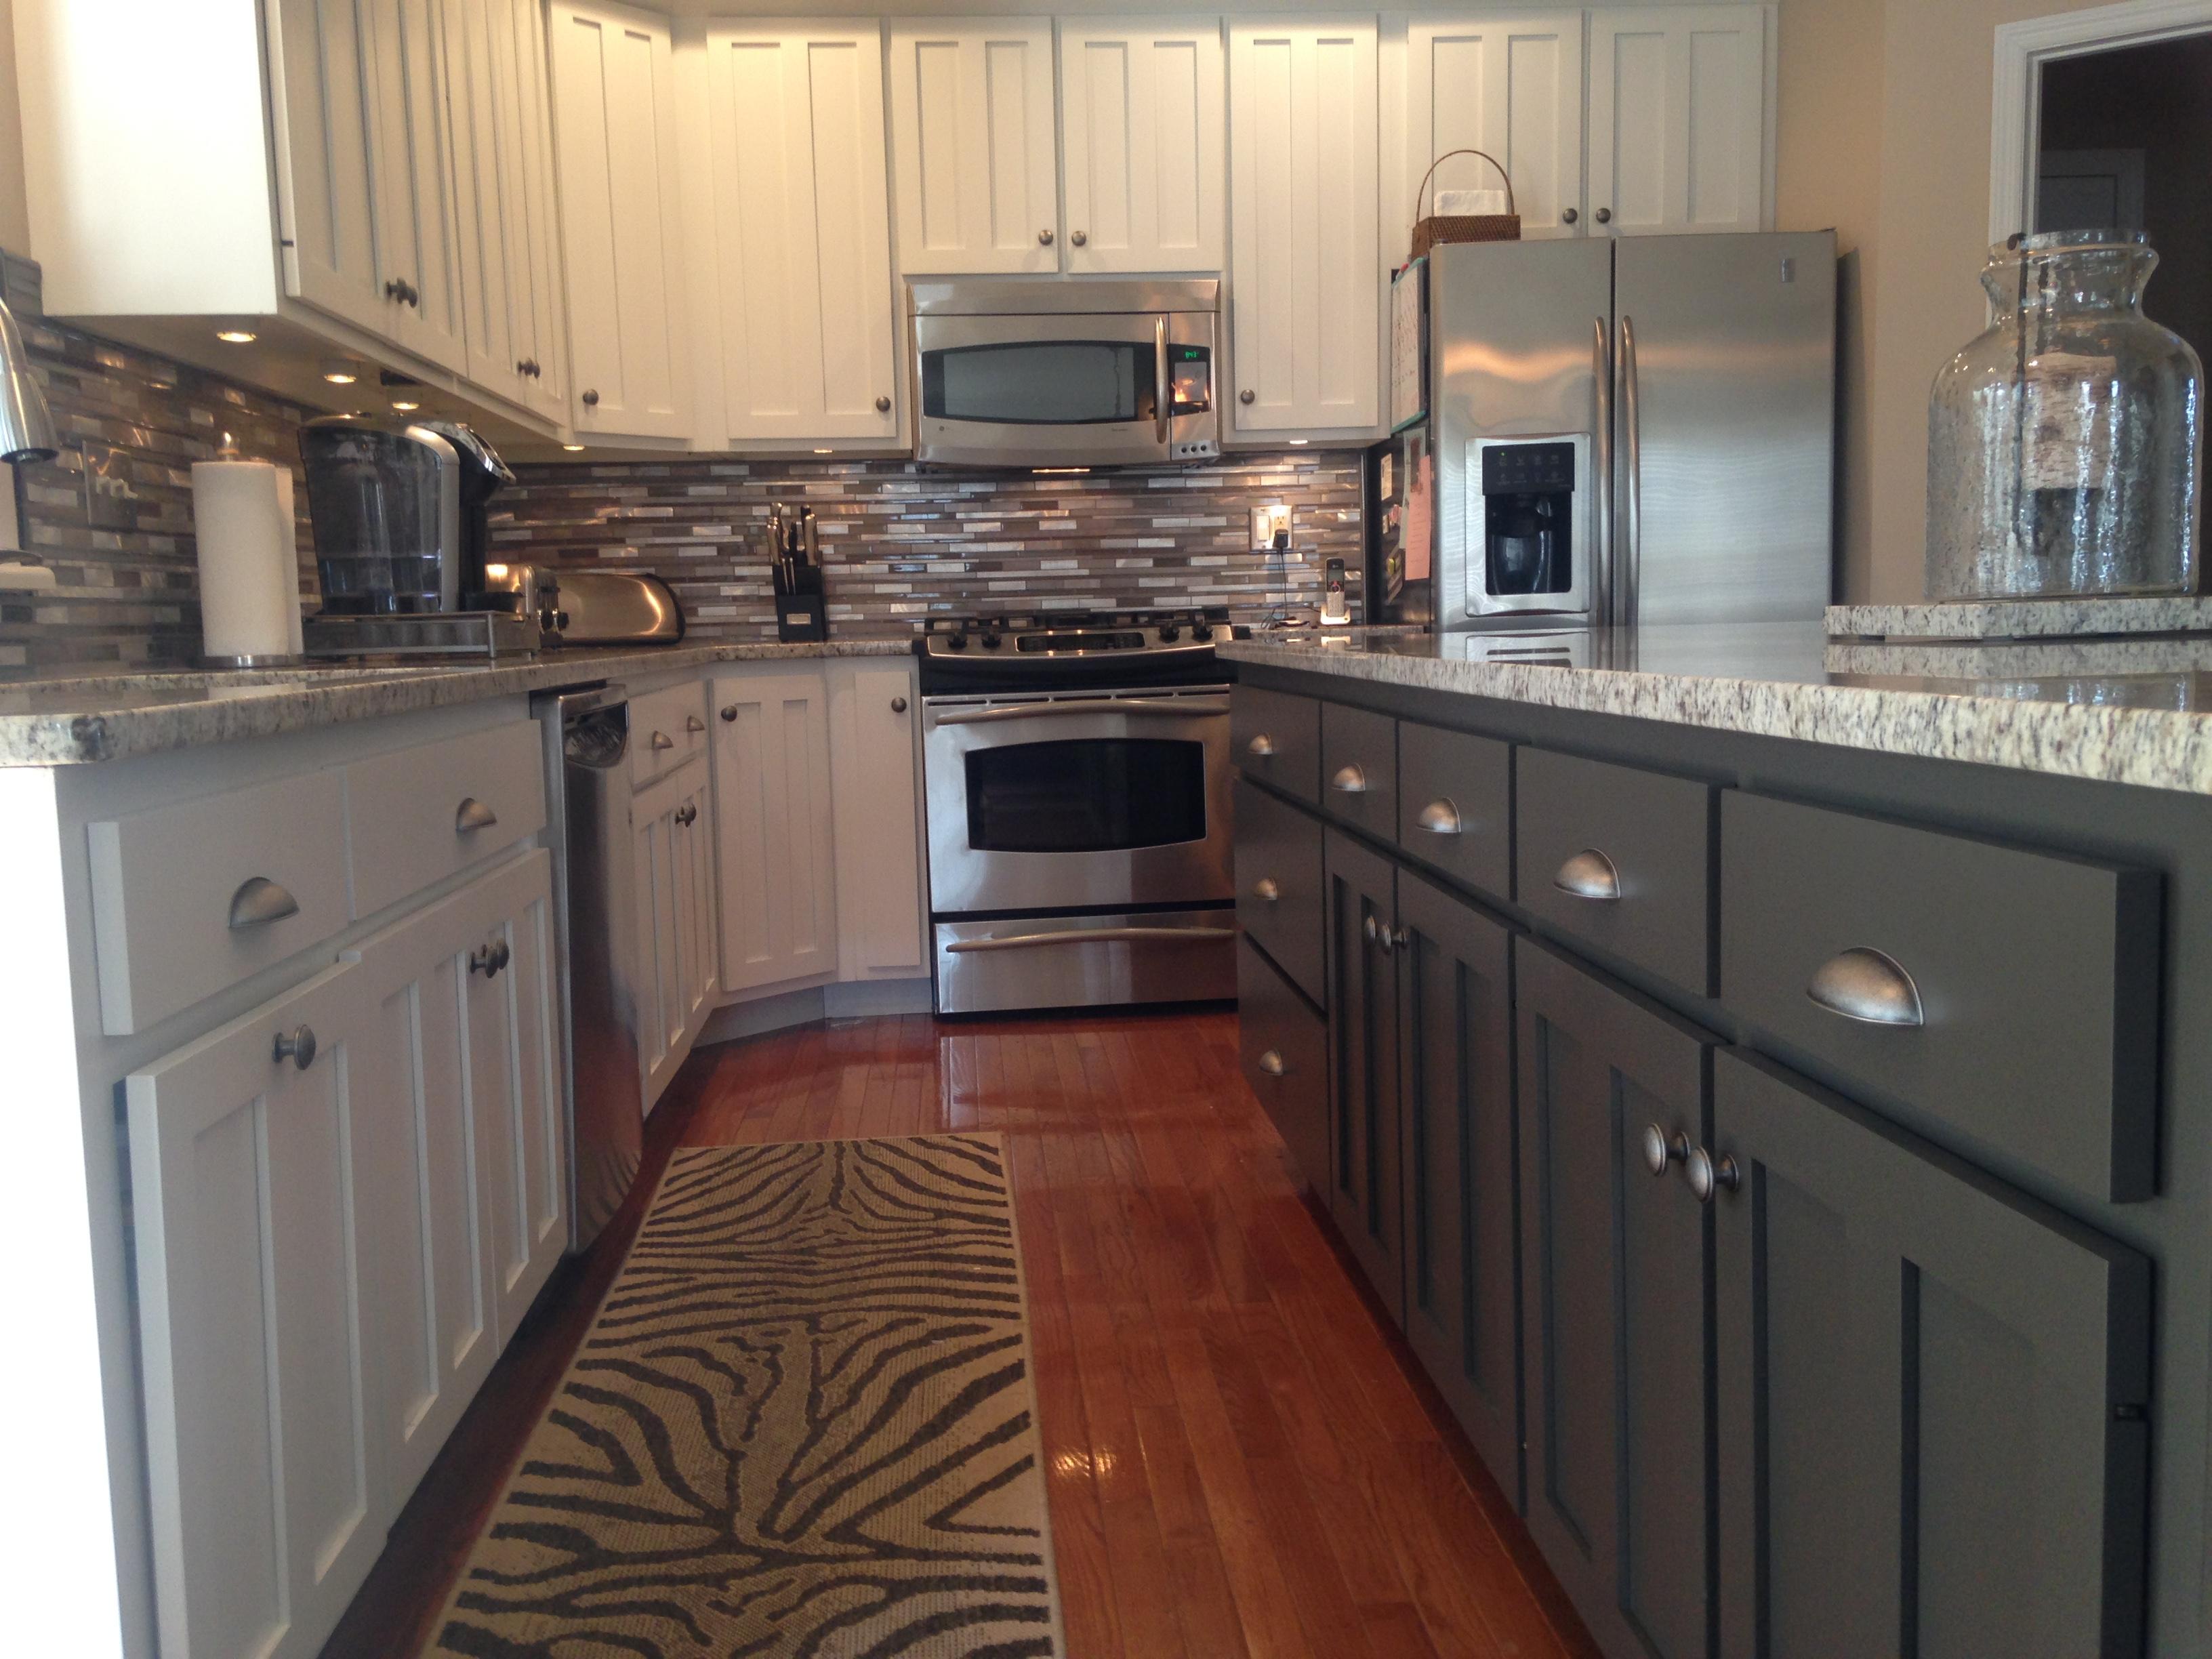 28 Kitchen Cabinets Harrisburg Pa Harrisburg Pa Contemporary Kitchen Renovation Mother